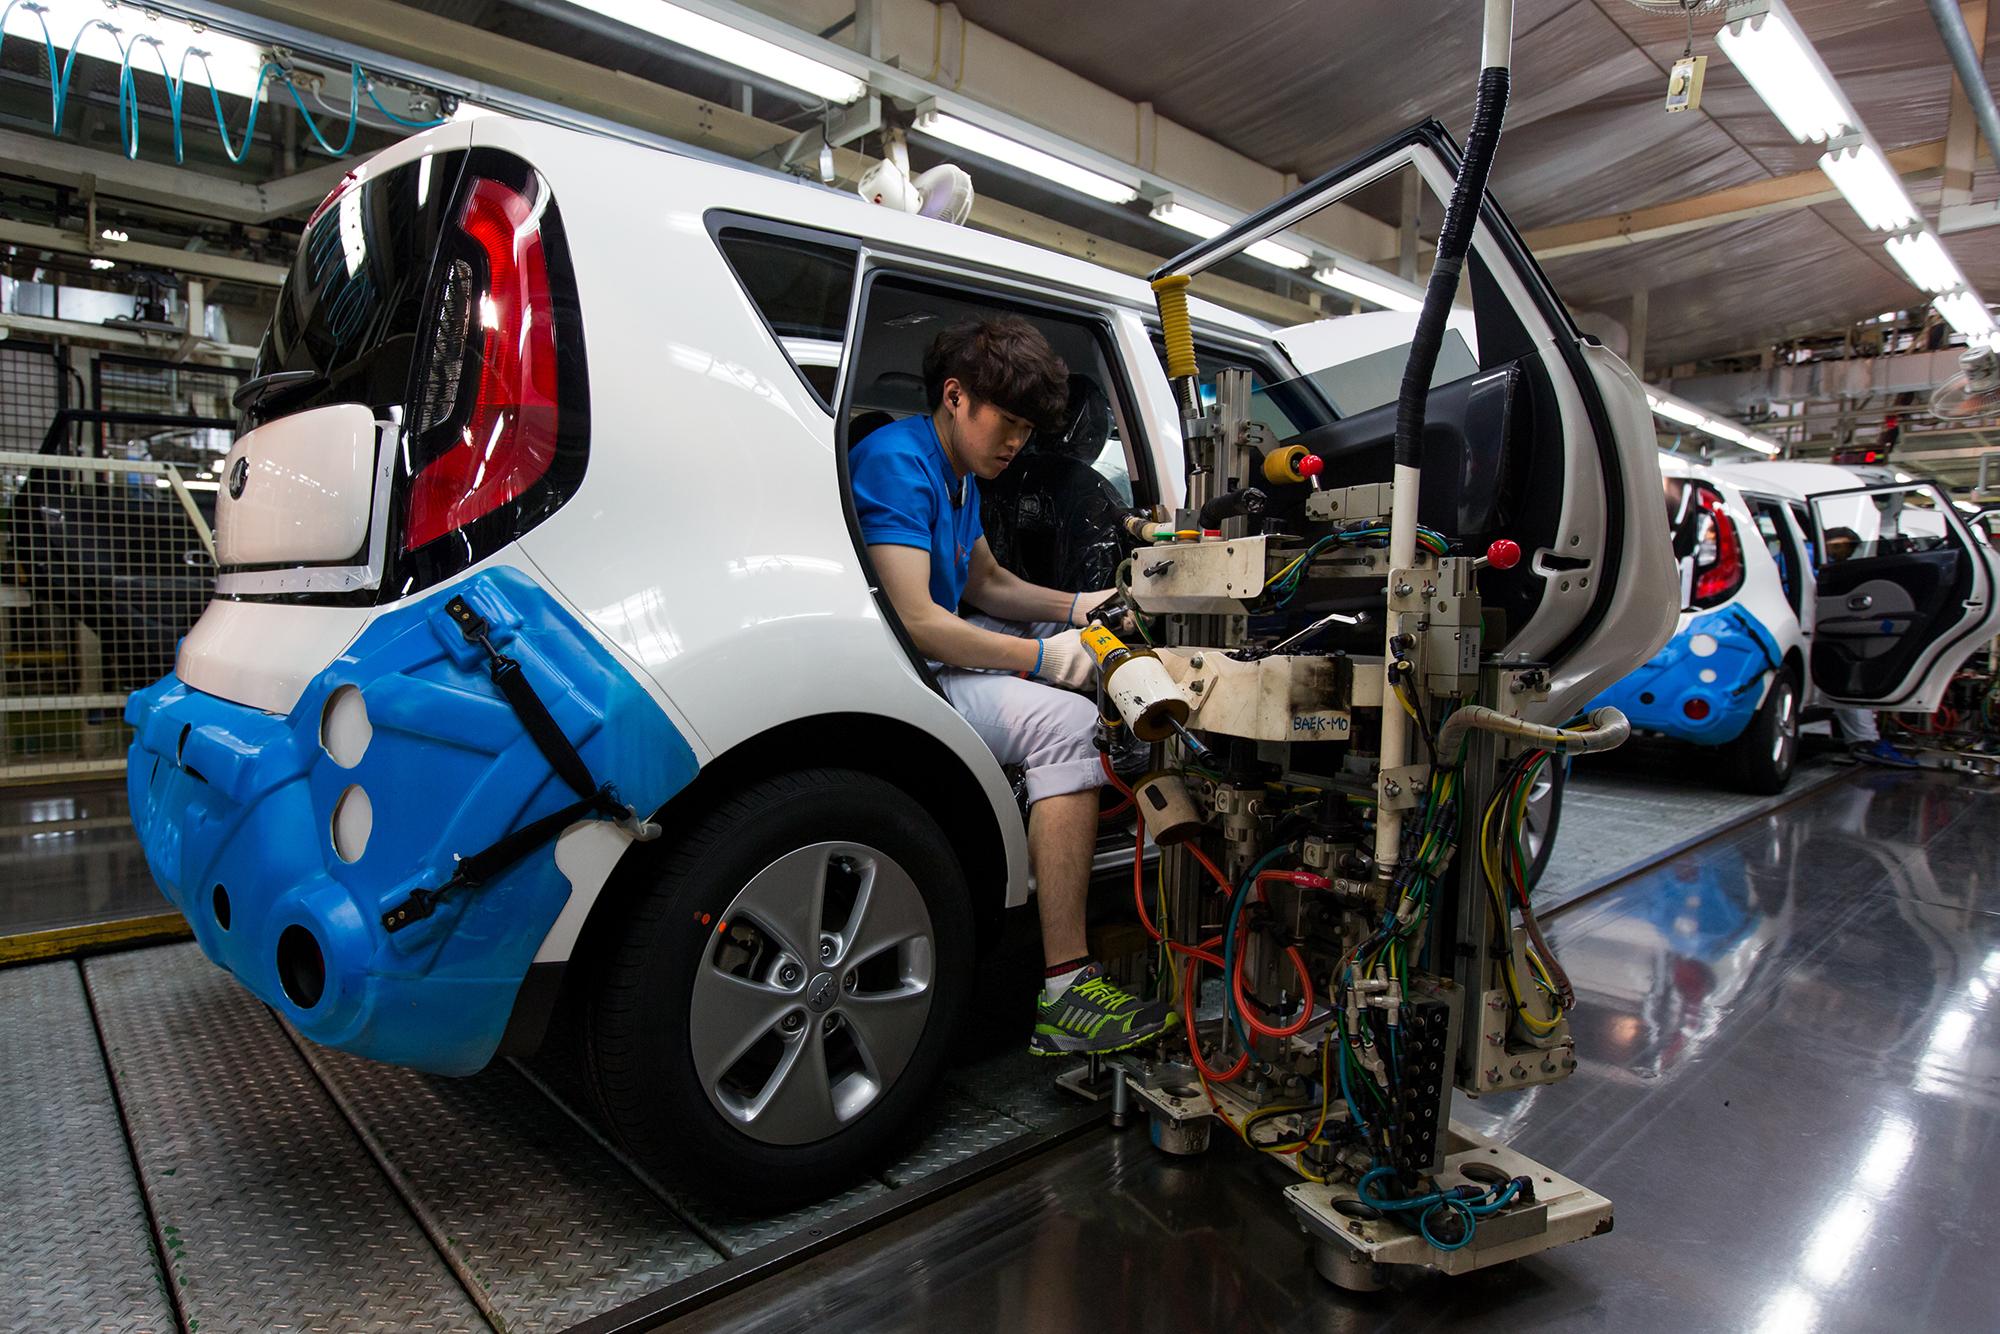 An employee works on a Kia Motors production line at the company's plant in Gwangju, South Korea, on Friday, July 8, 2016.